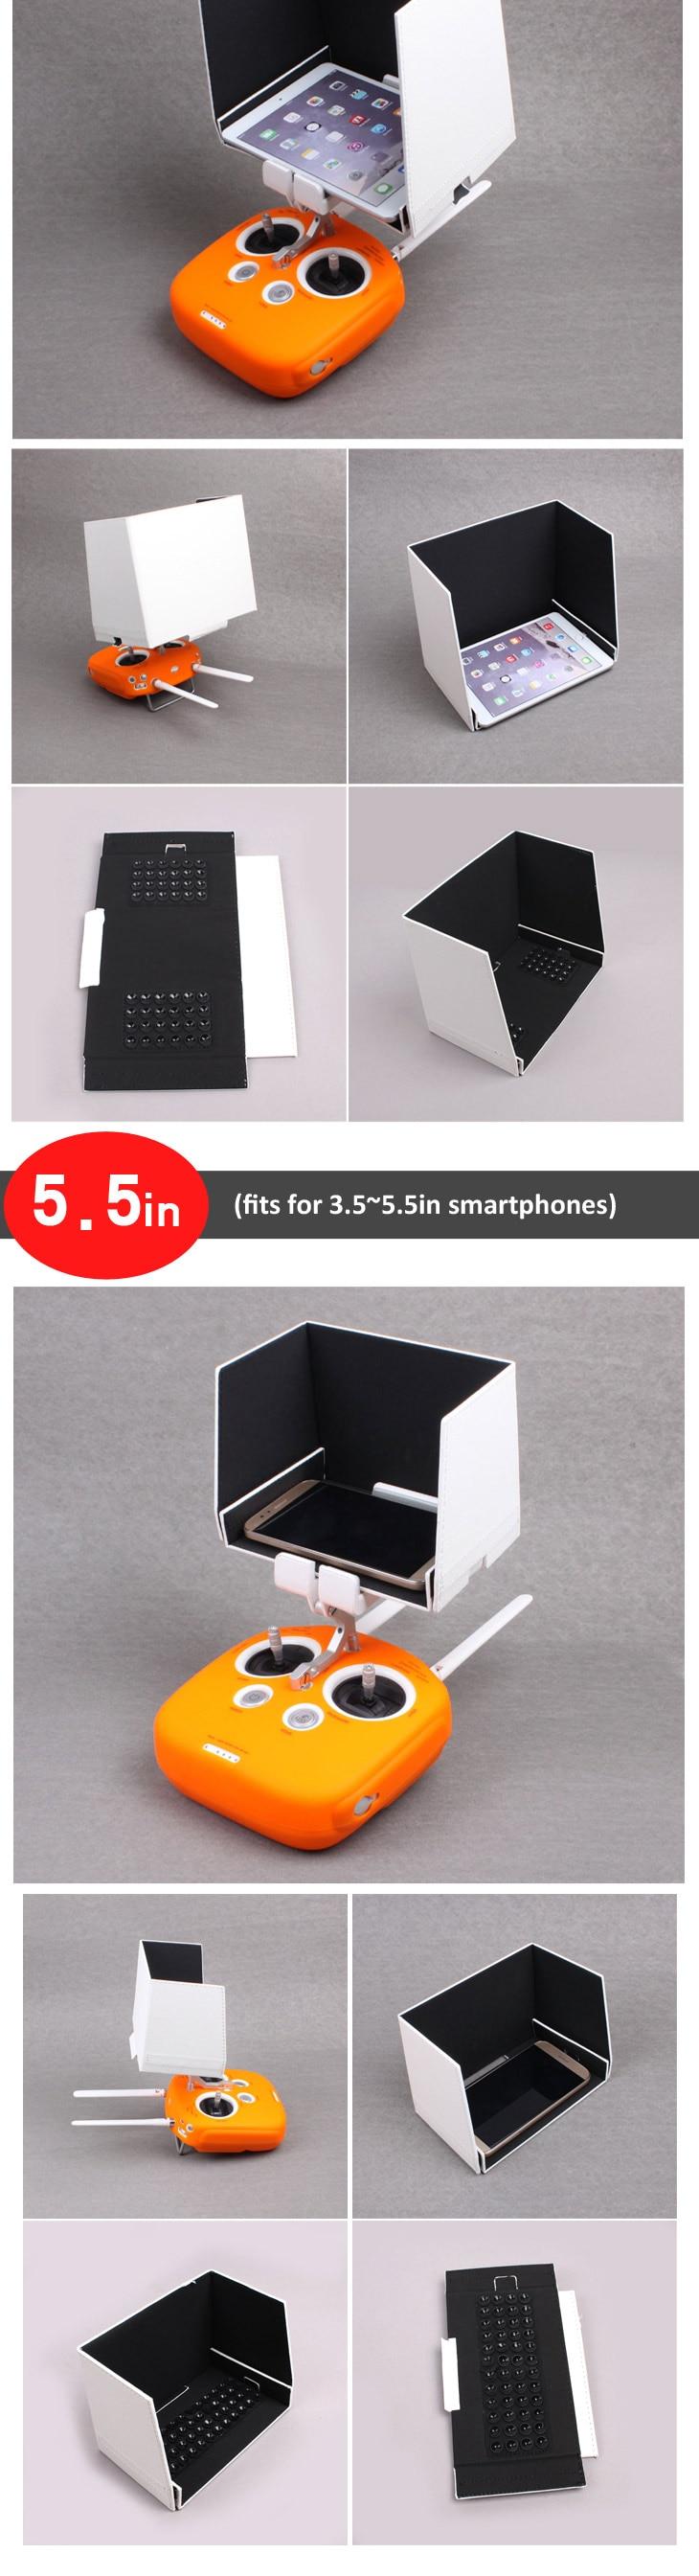 Aerial Photograph 5 5in Smartphone Sunshade 7 9in 9 7in Tablet Sun Hood for  DJI Inspire Phantom 4 4 PRO V2 0 Phantom 3 2